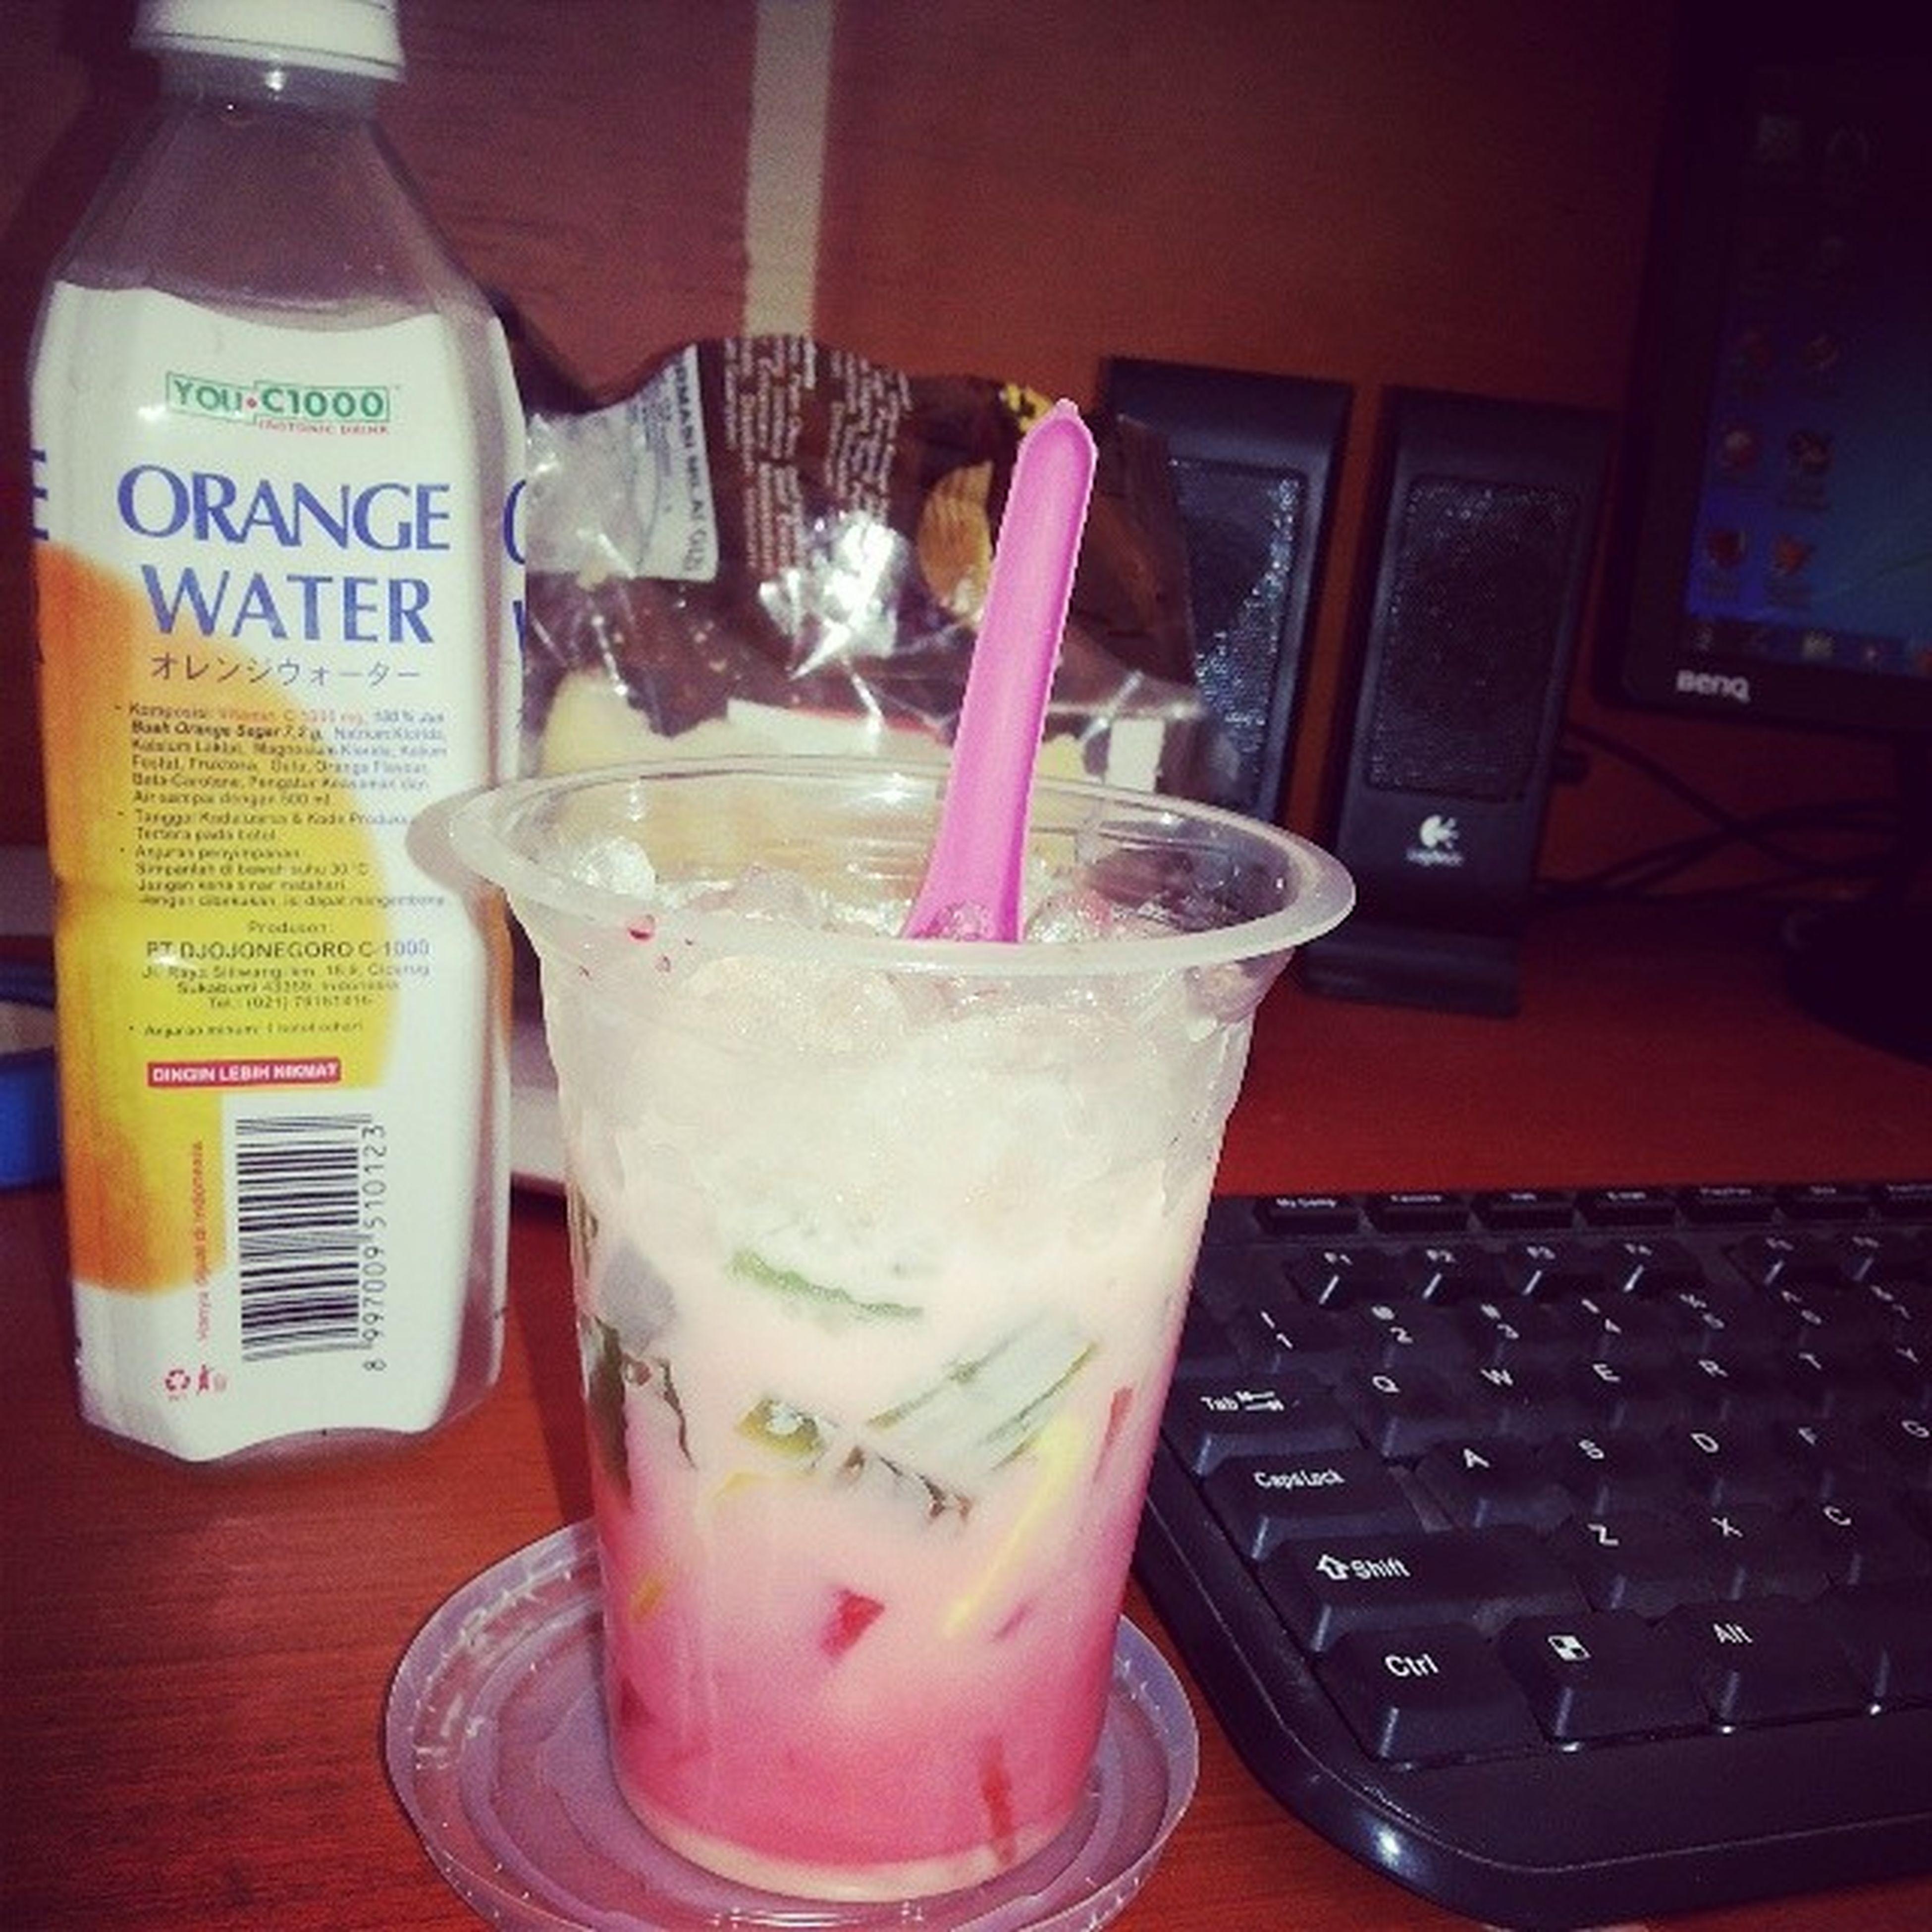 Siang yg terik :) officeEs_buah 44 Warung_jawa Sidakarya Meleleh